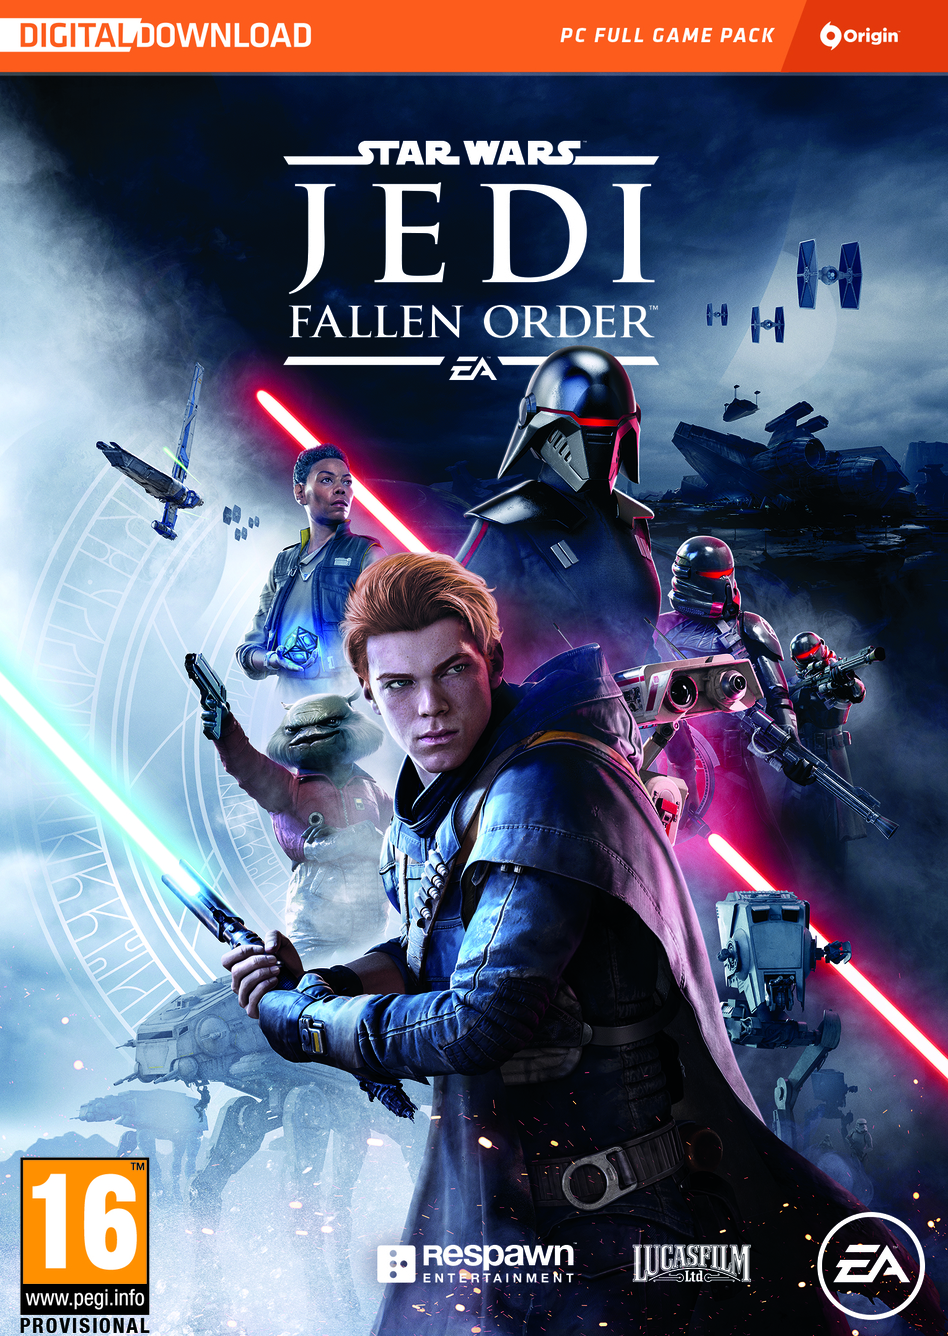 STAR WARS Jedi: Fallen Order(ANZ+ASIA+NCSA) - Origin